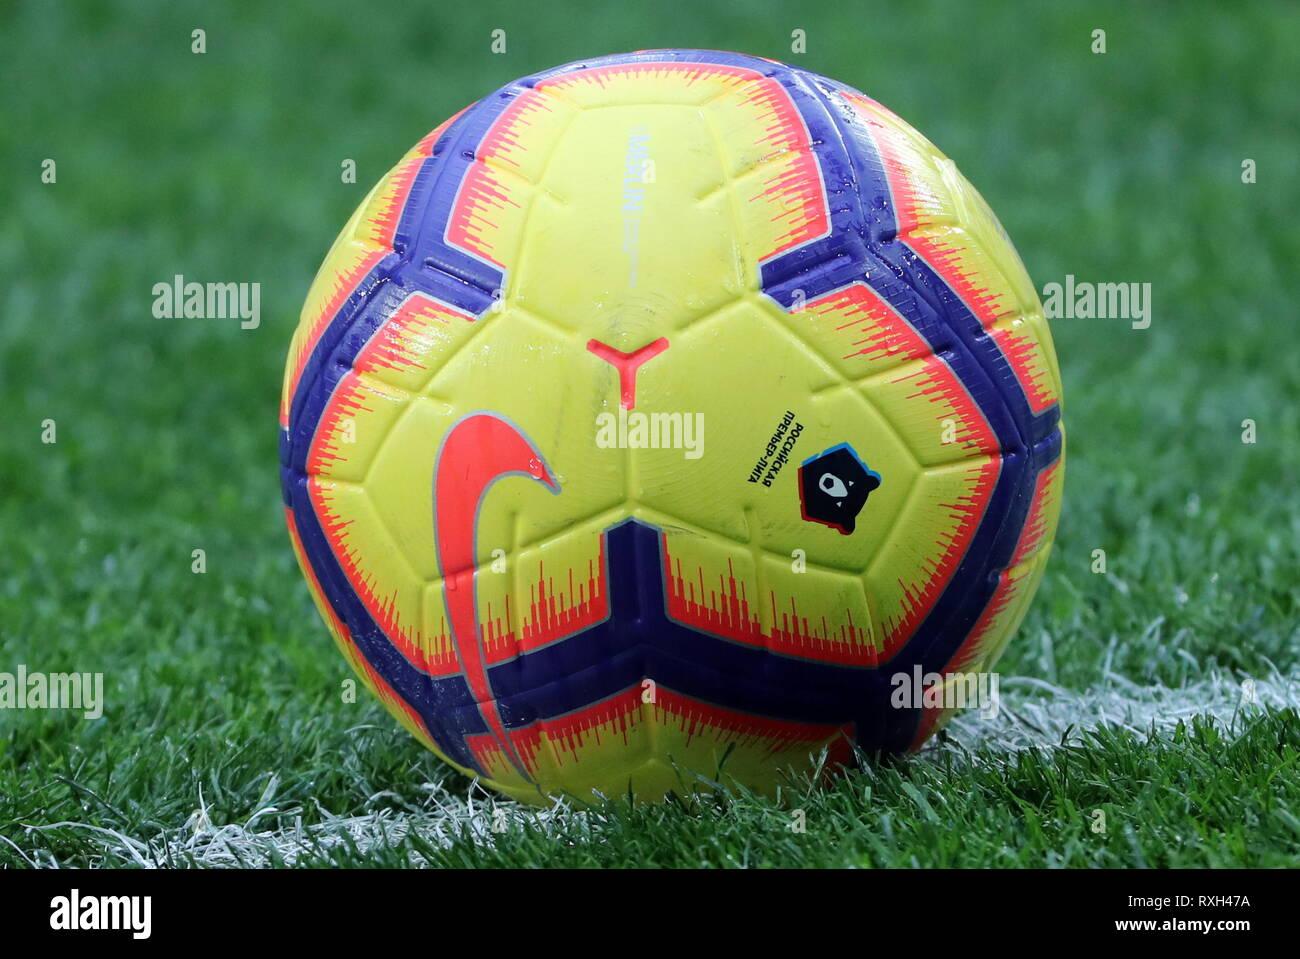 21d6ea4b1603 Nike Premier League Football 2019 Stock Photos   Nike Premier League ...